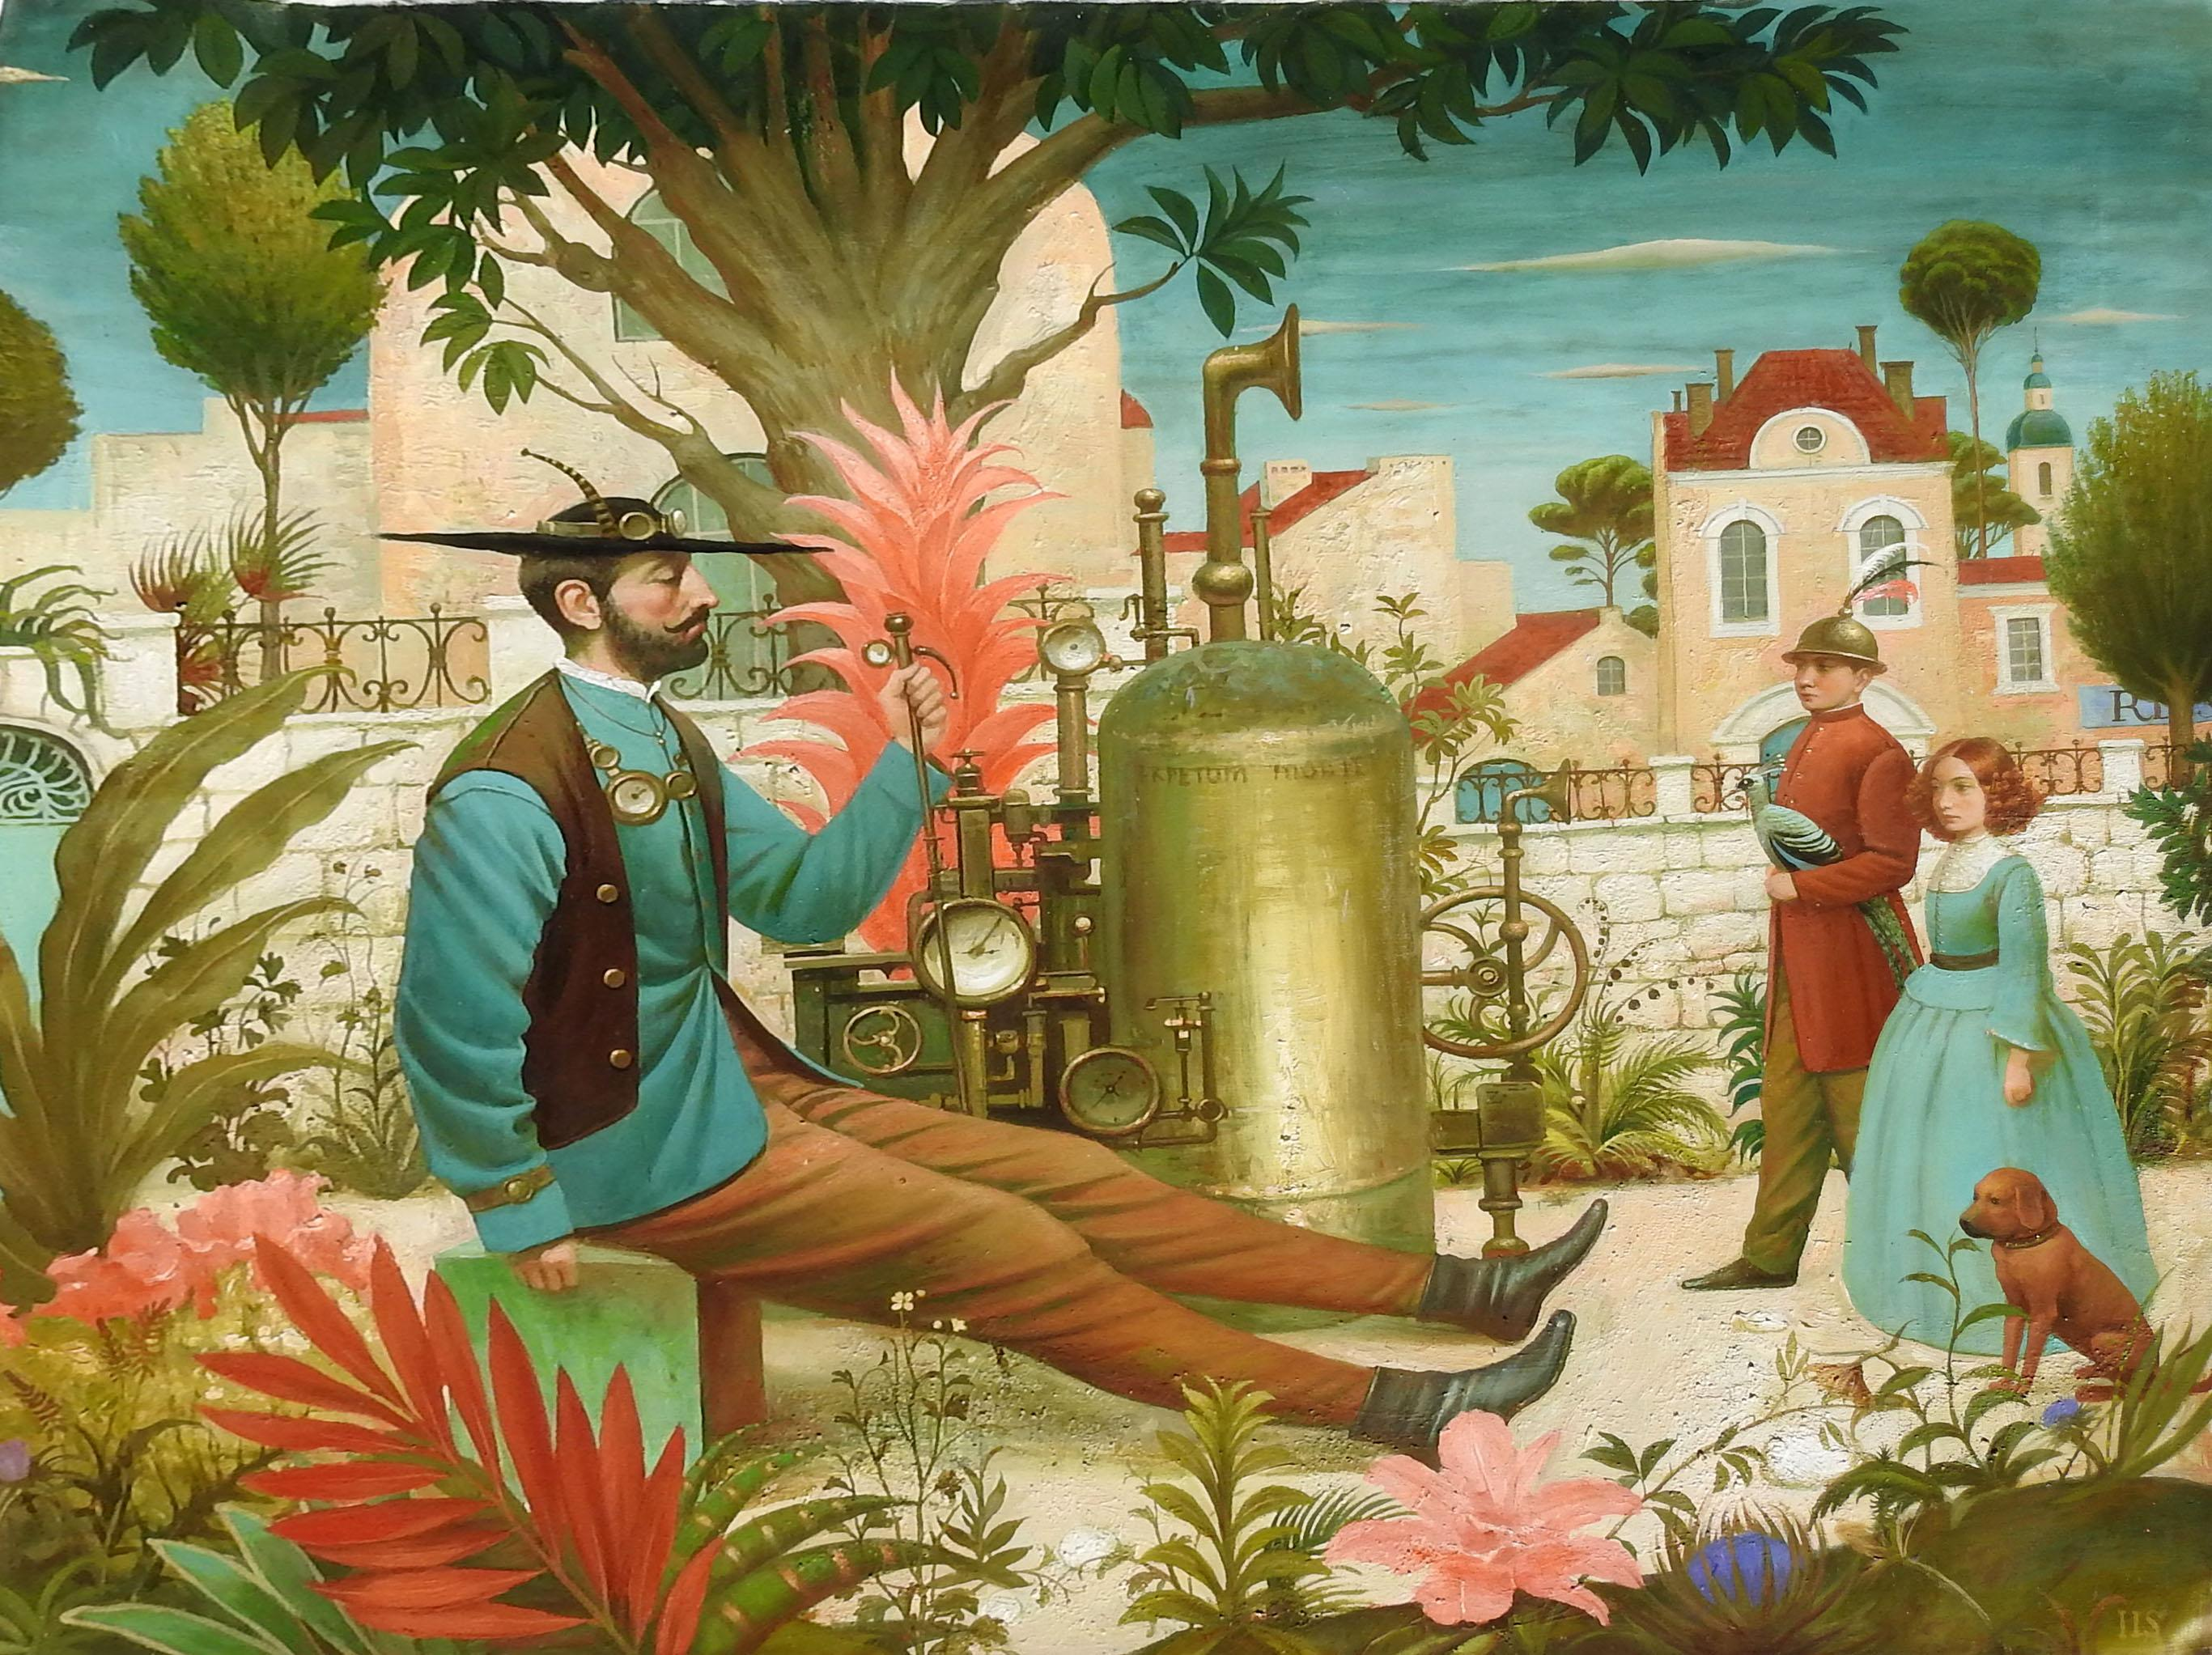 """The Inventor"", Igor Samsonov, Surrealism, Figurative, Original Oil, 47x54 in."